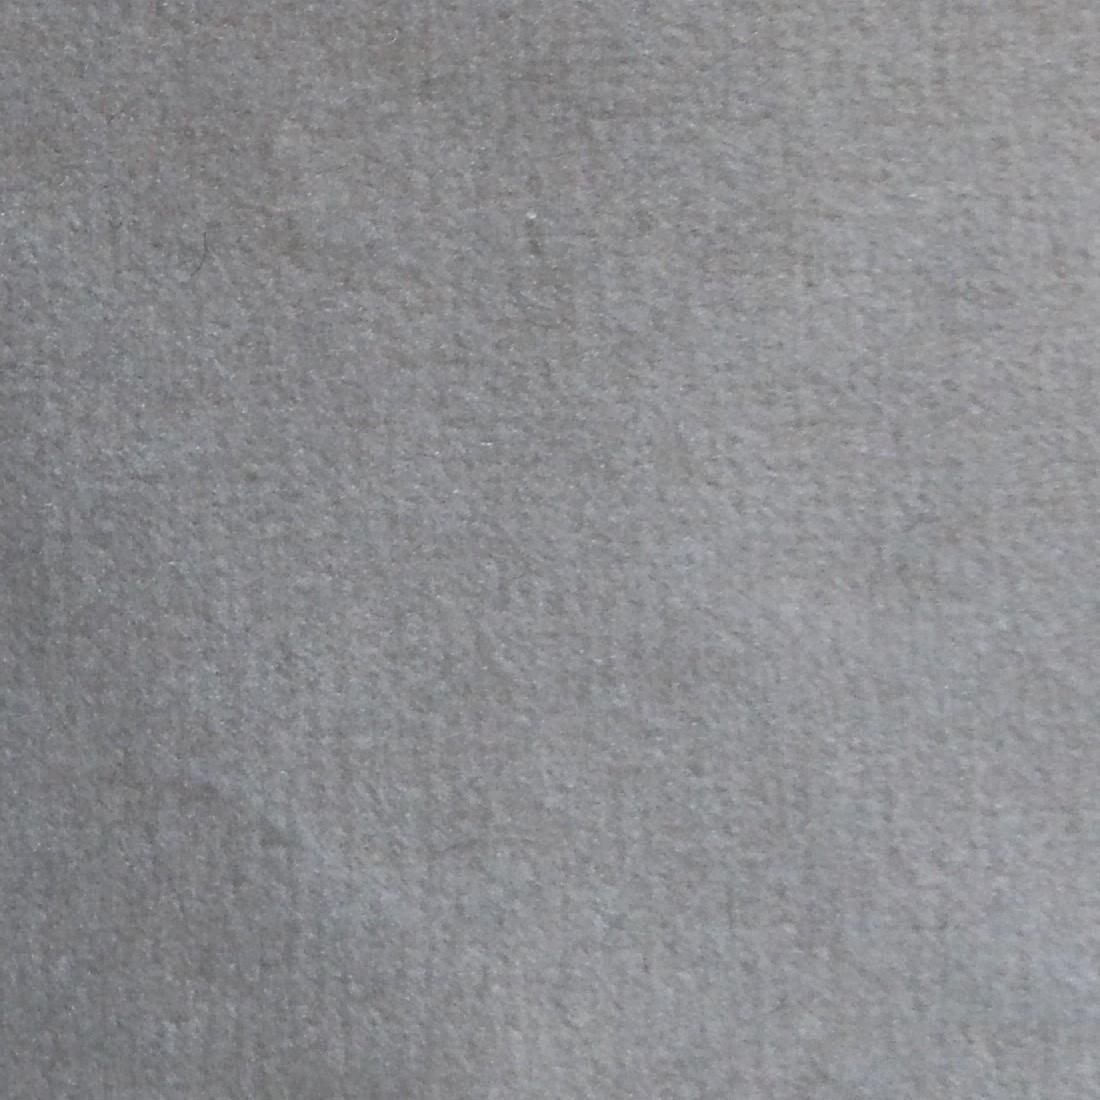 Gris 2731 / blanc 2114